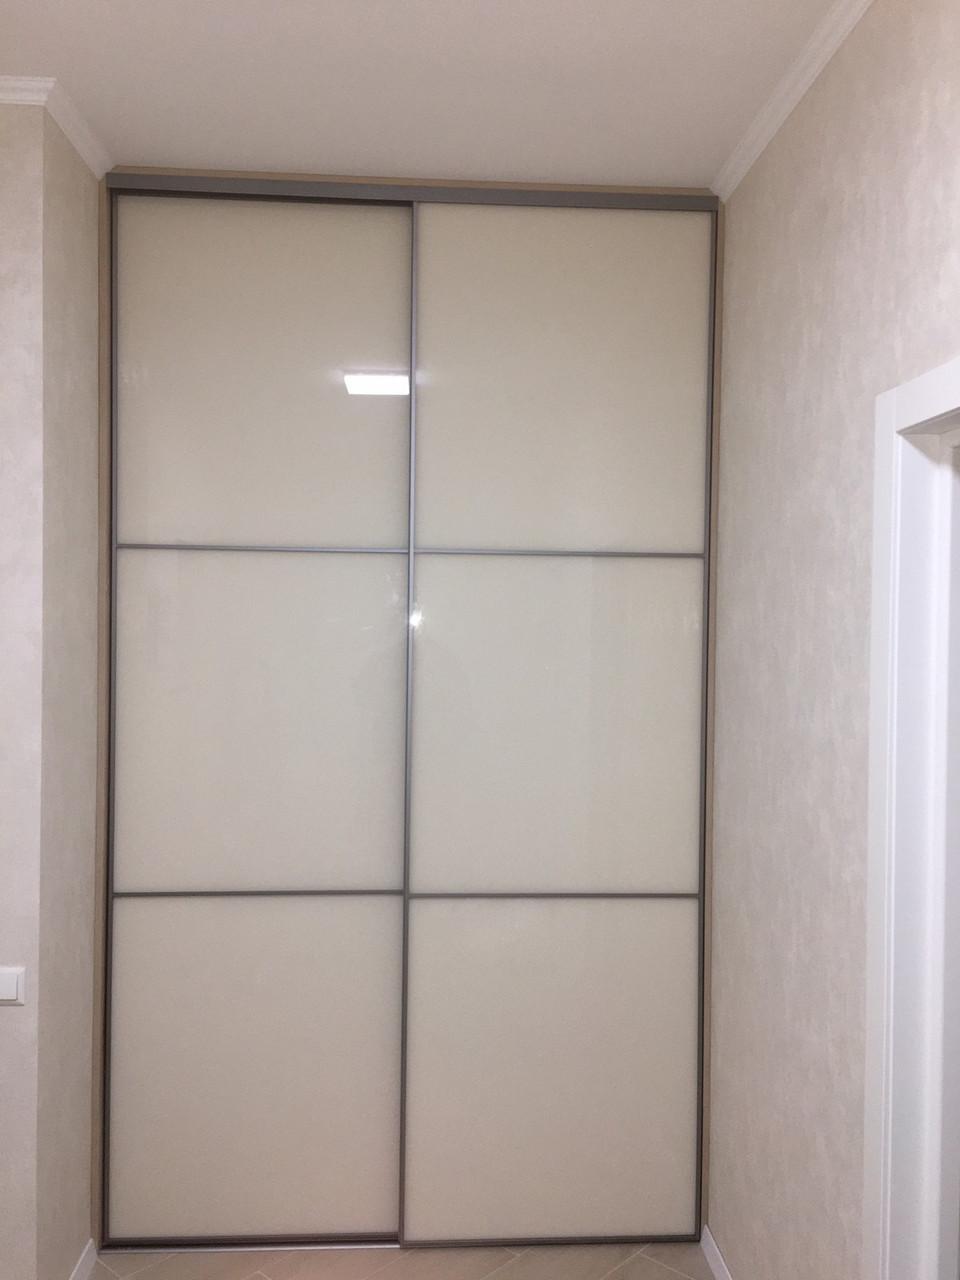 Шкаф купе с системой zola гардеробная комната внутри шкафа купе